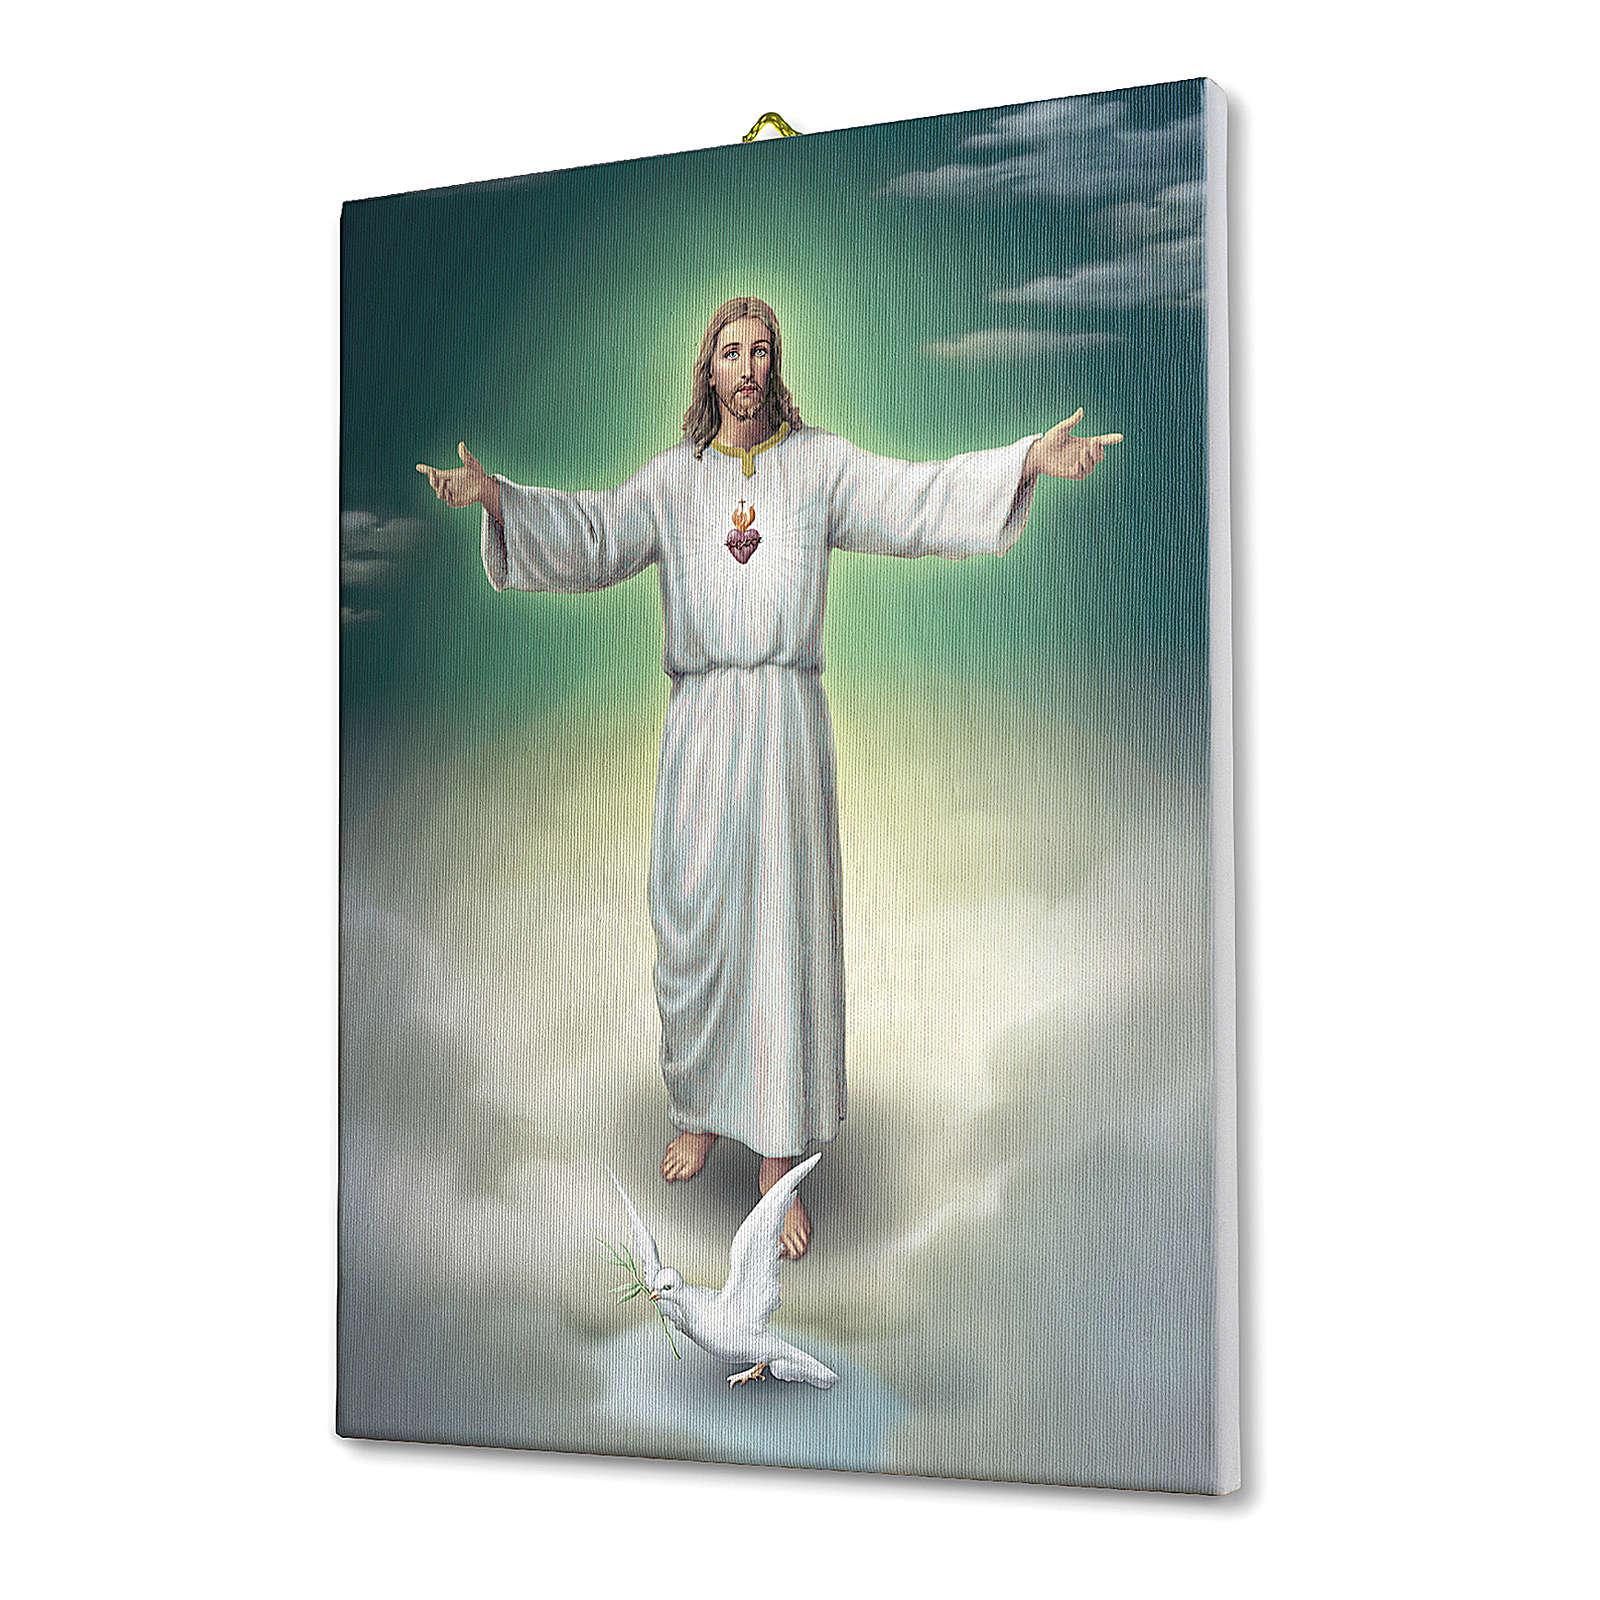 Print on canvas Hug of Jesus 40x30 cm 3